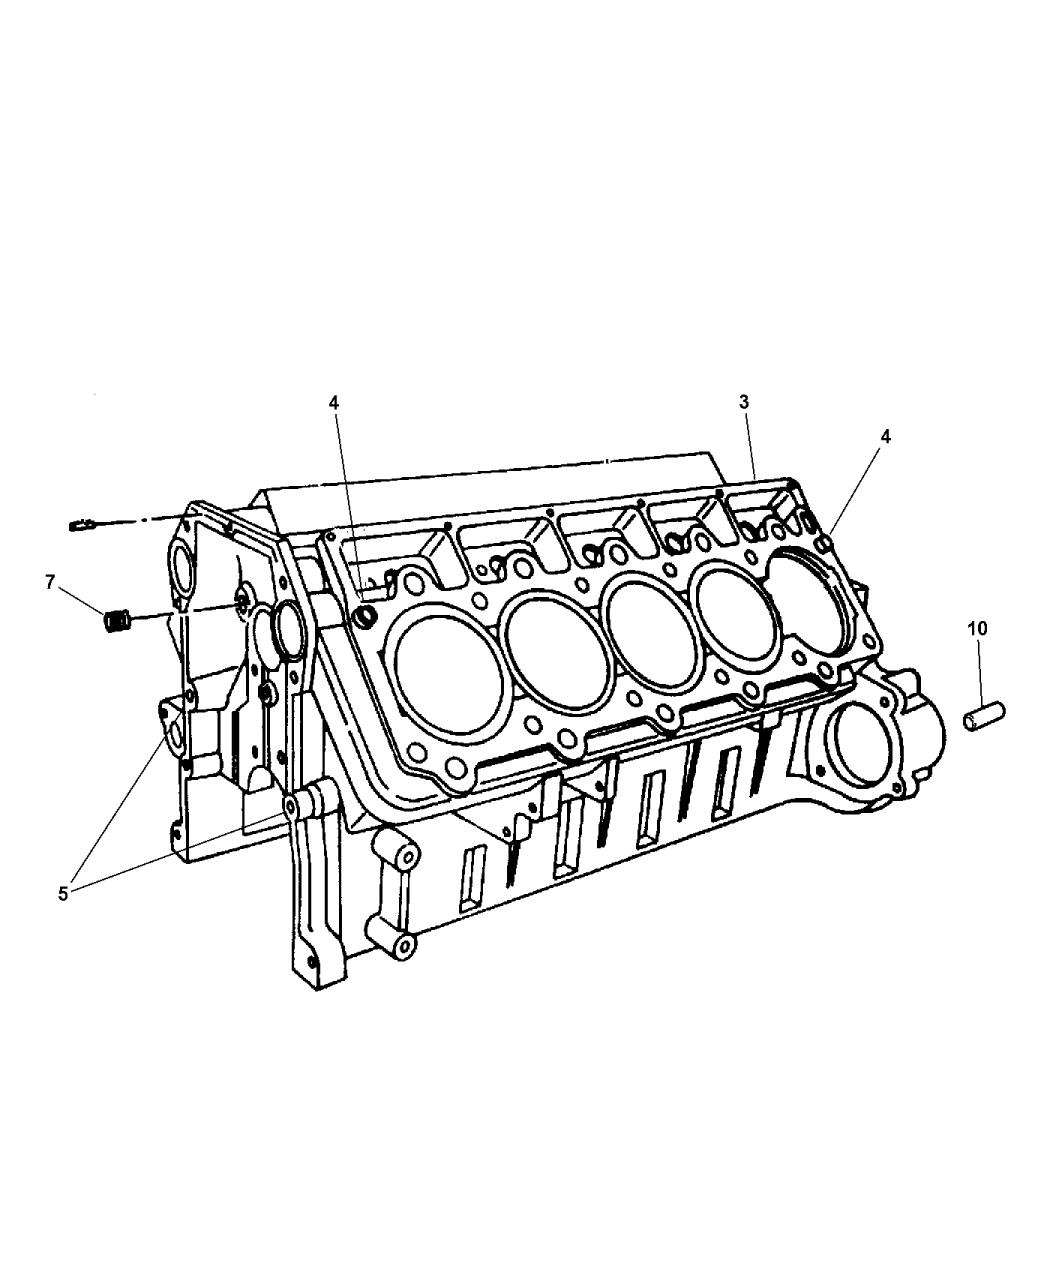 2004 Dodge Viper Block, Cylinder